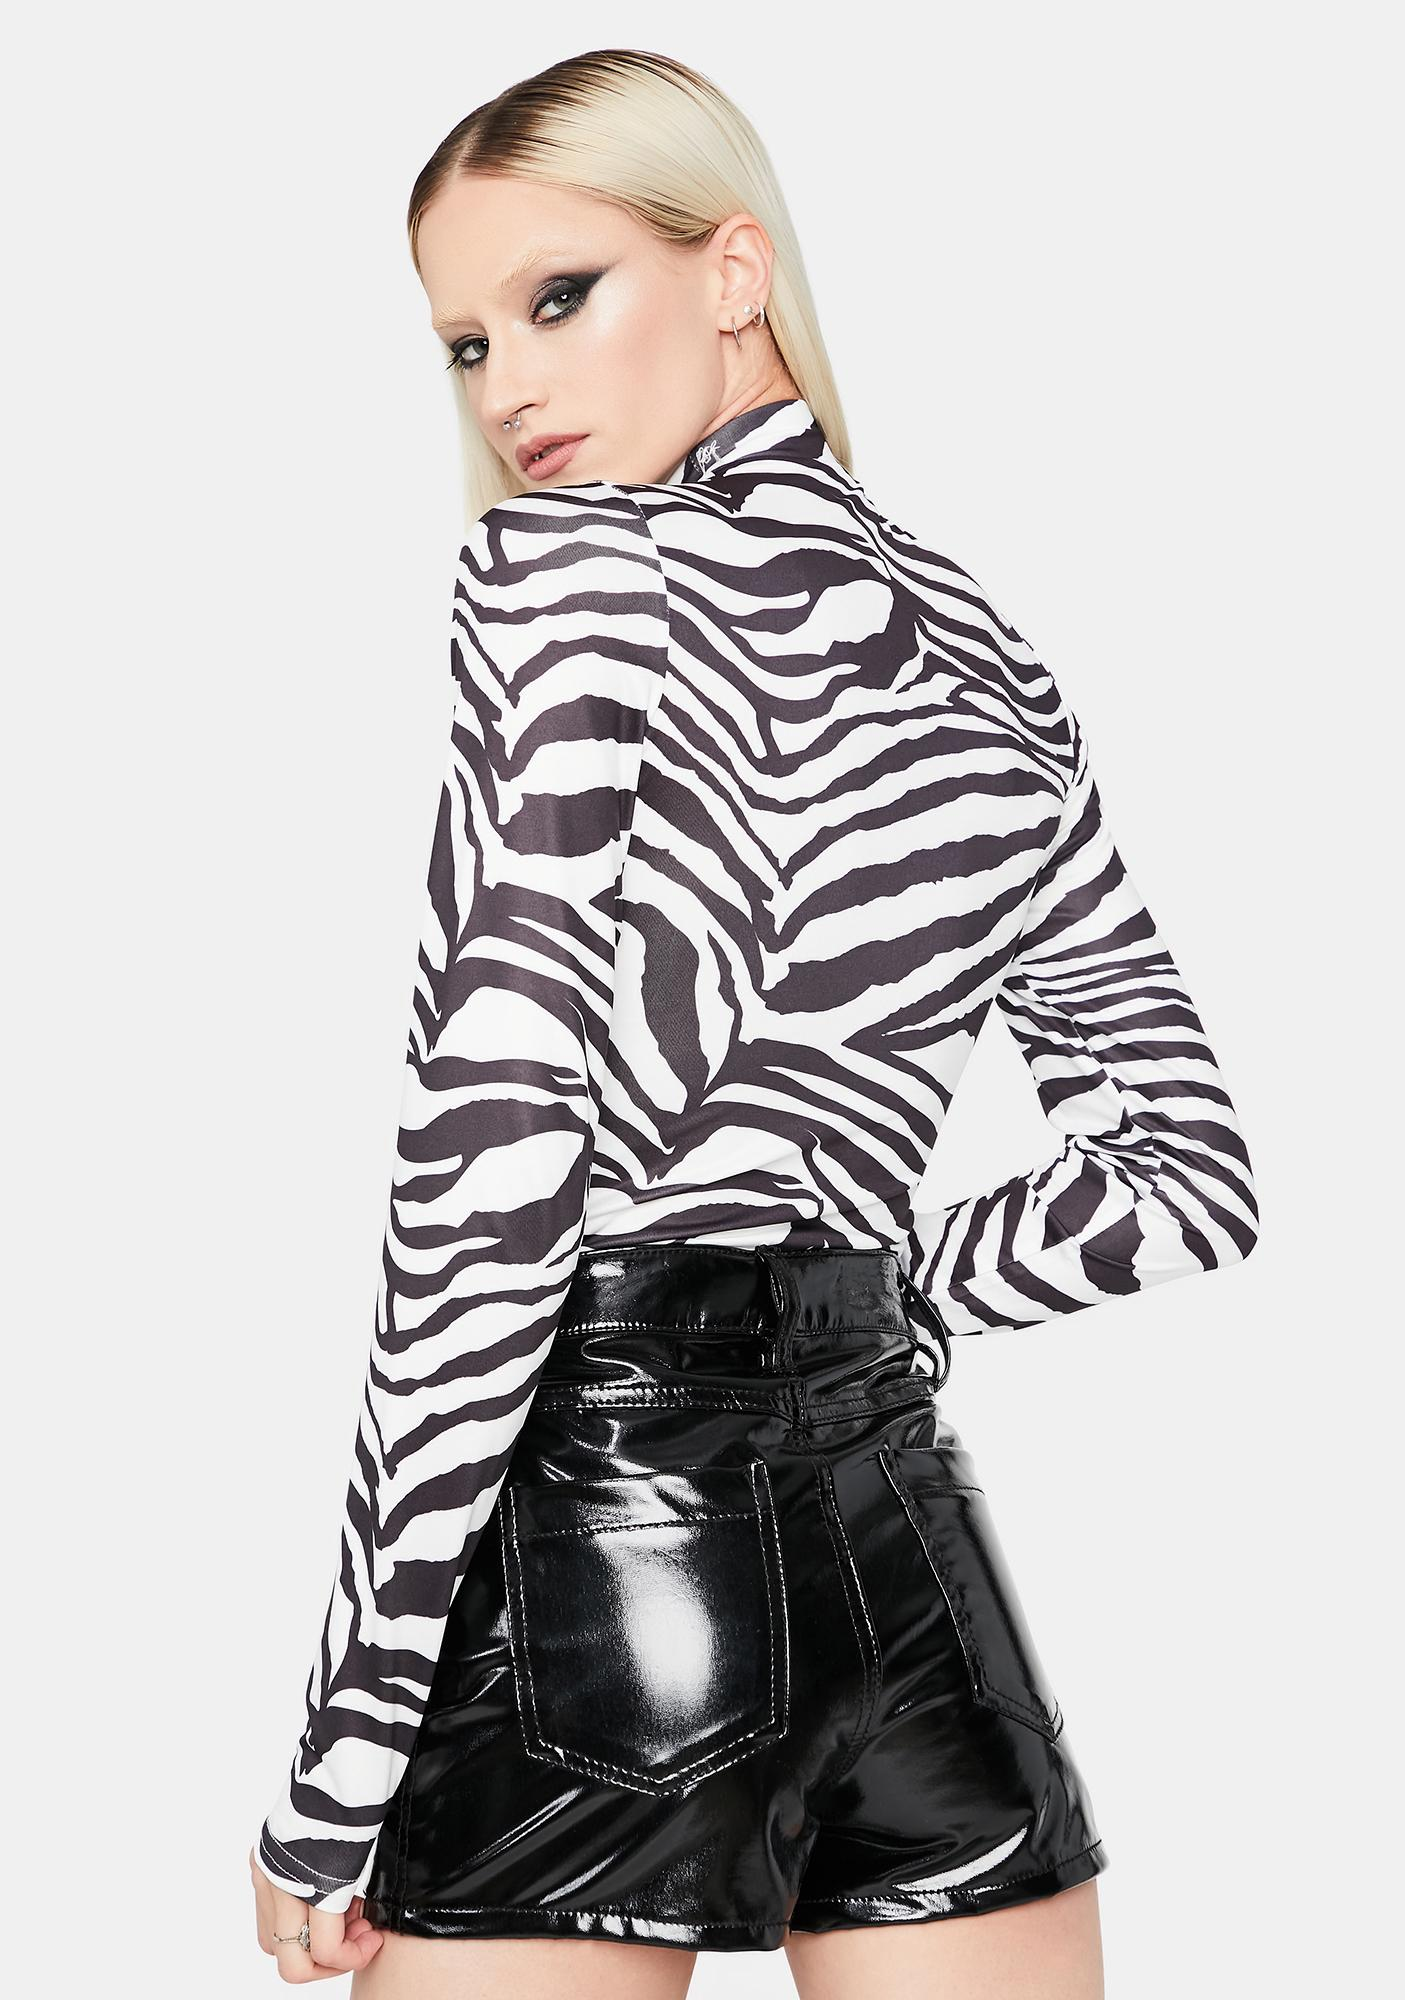 Pure Zebra Roar Cut Out Bodysuit